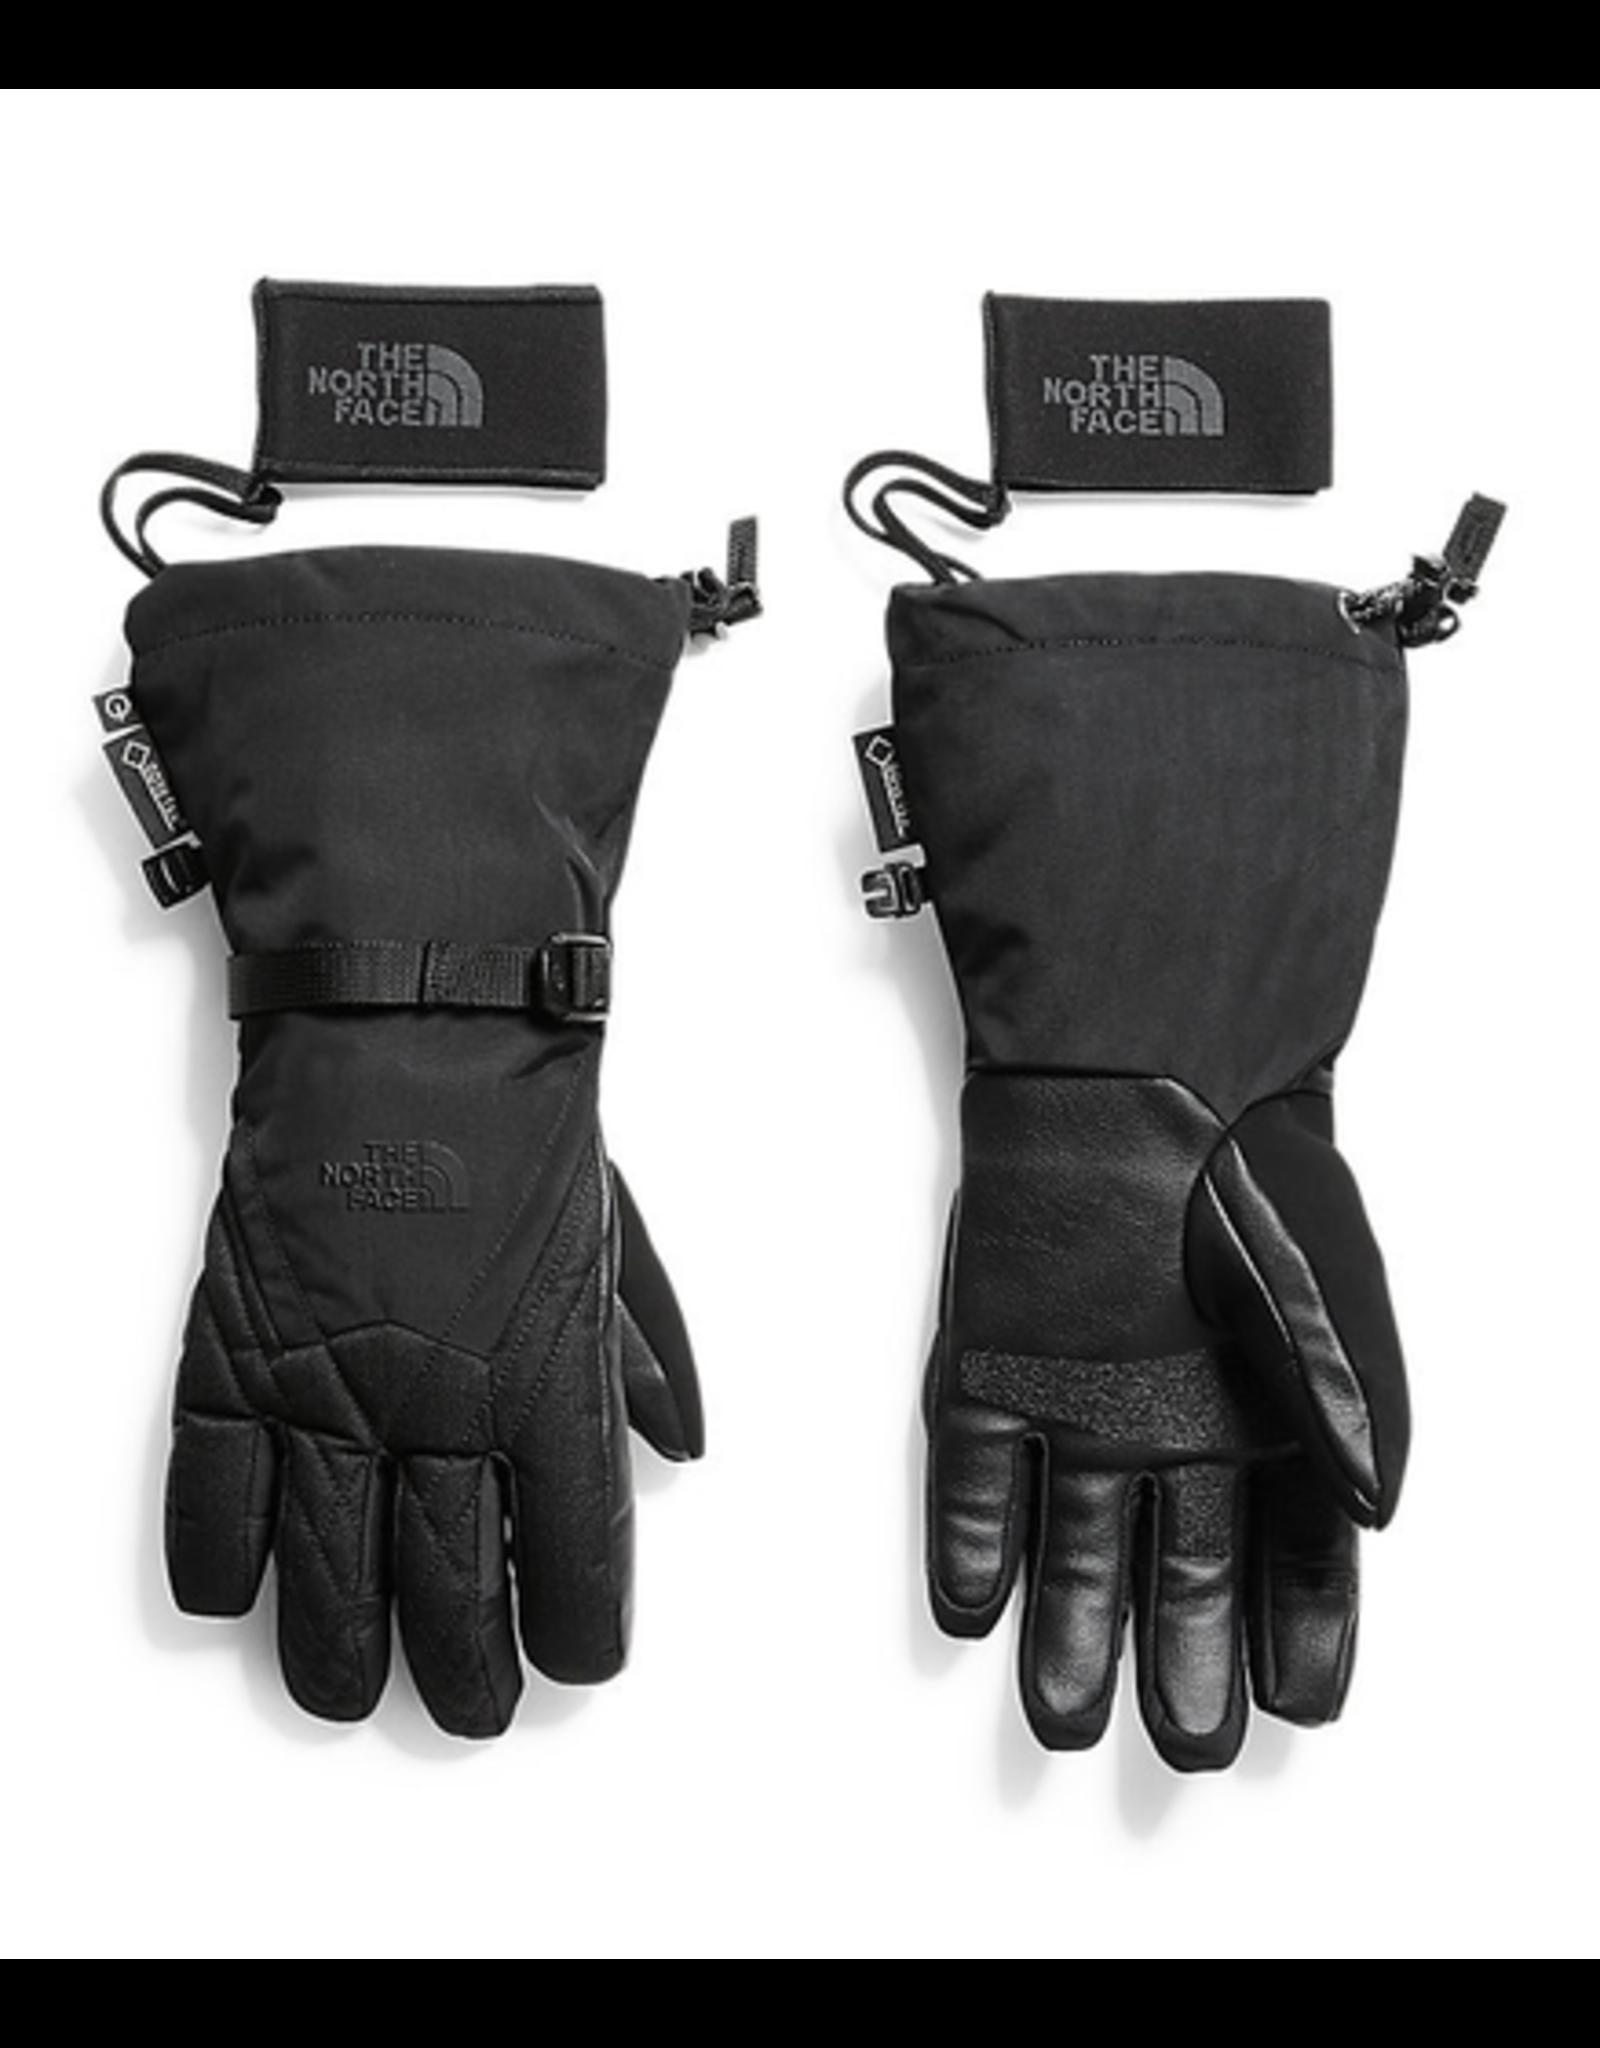 North Face North Face Women's Montana Gore-Tex Etip Gloves